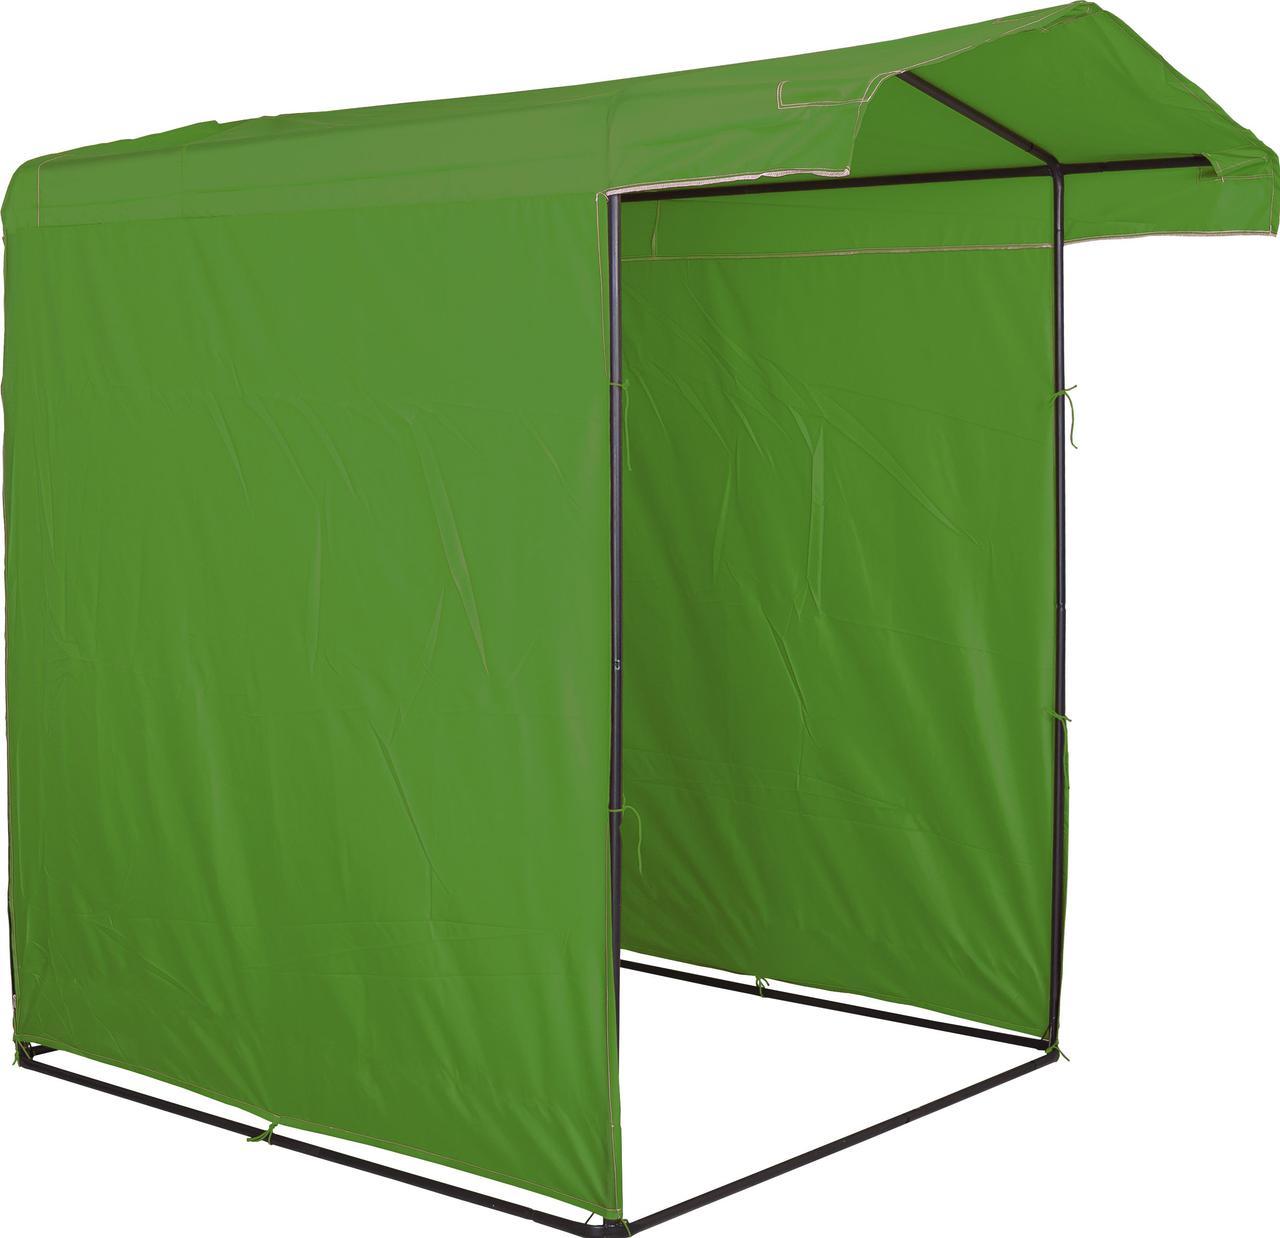 "Торговая палатка ""Стандарт"" 1,5х1,5."